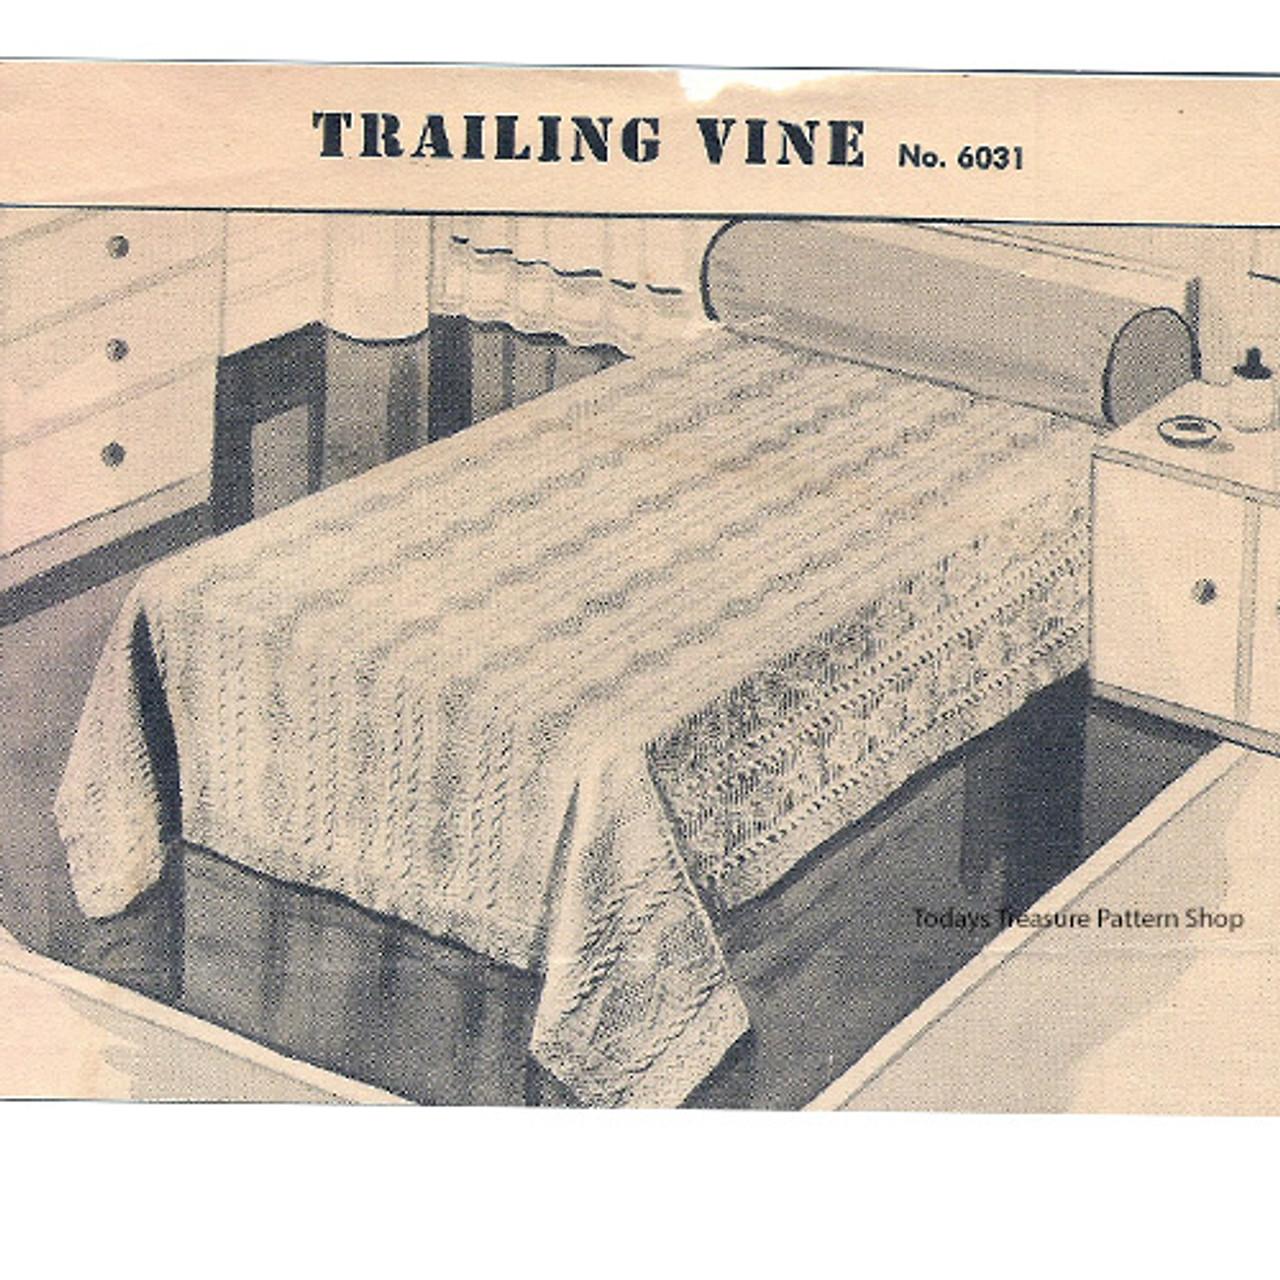 Knitted Trailing Vine Bedspread Pattern